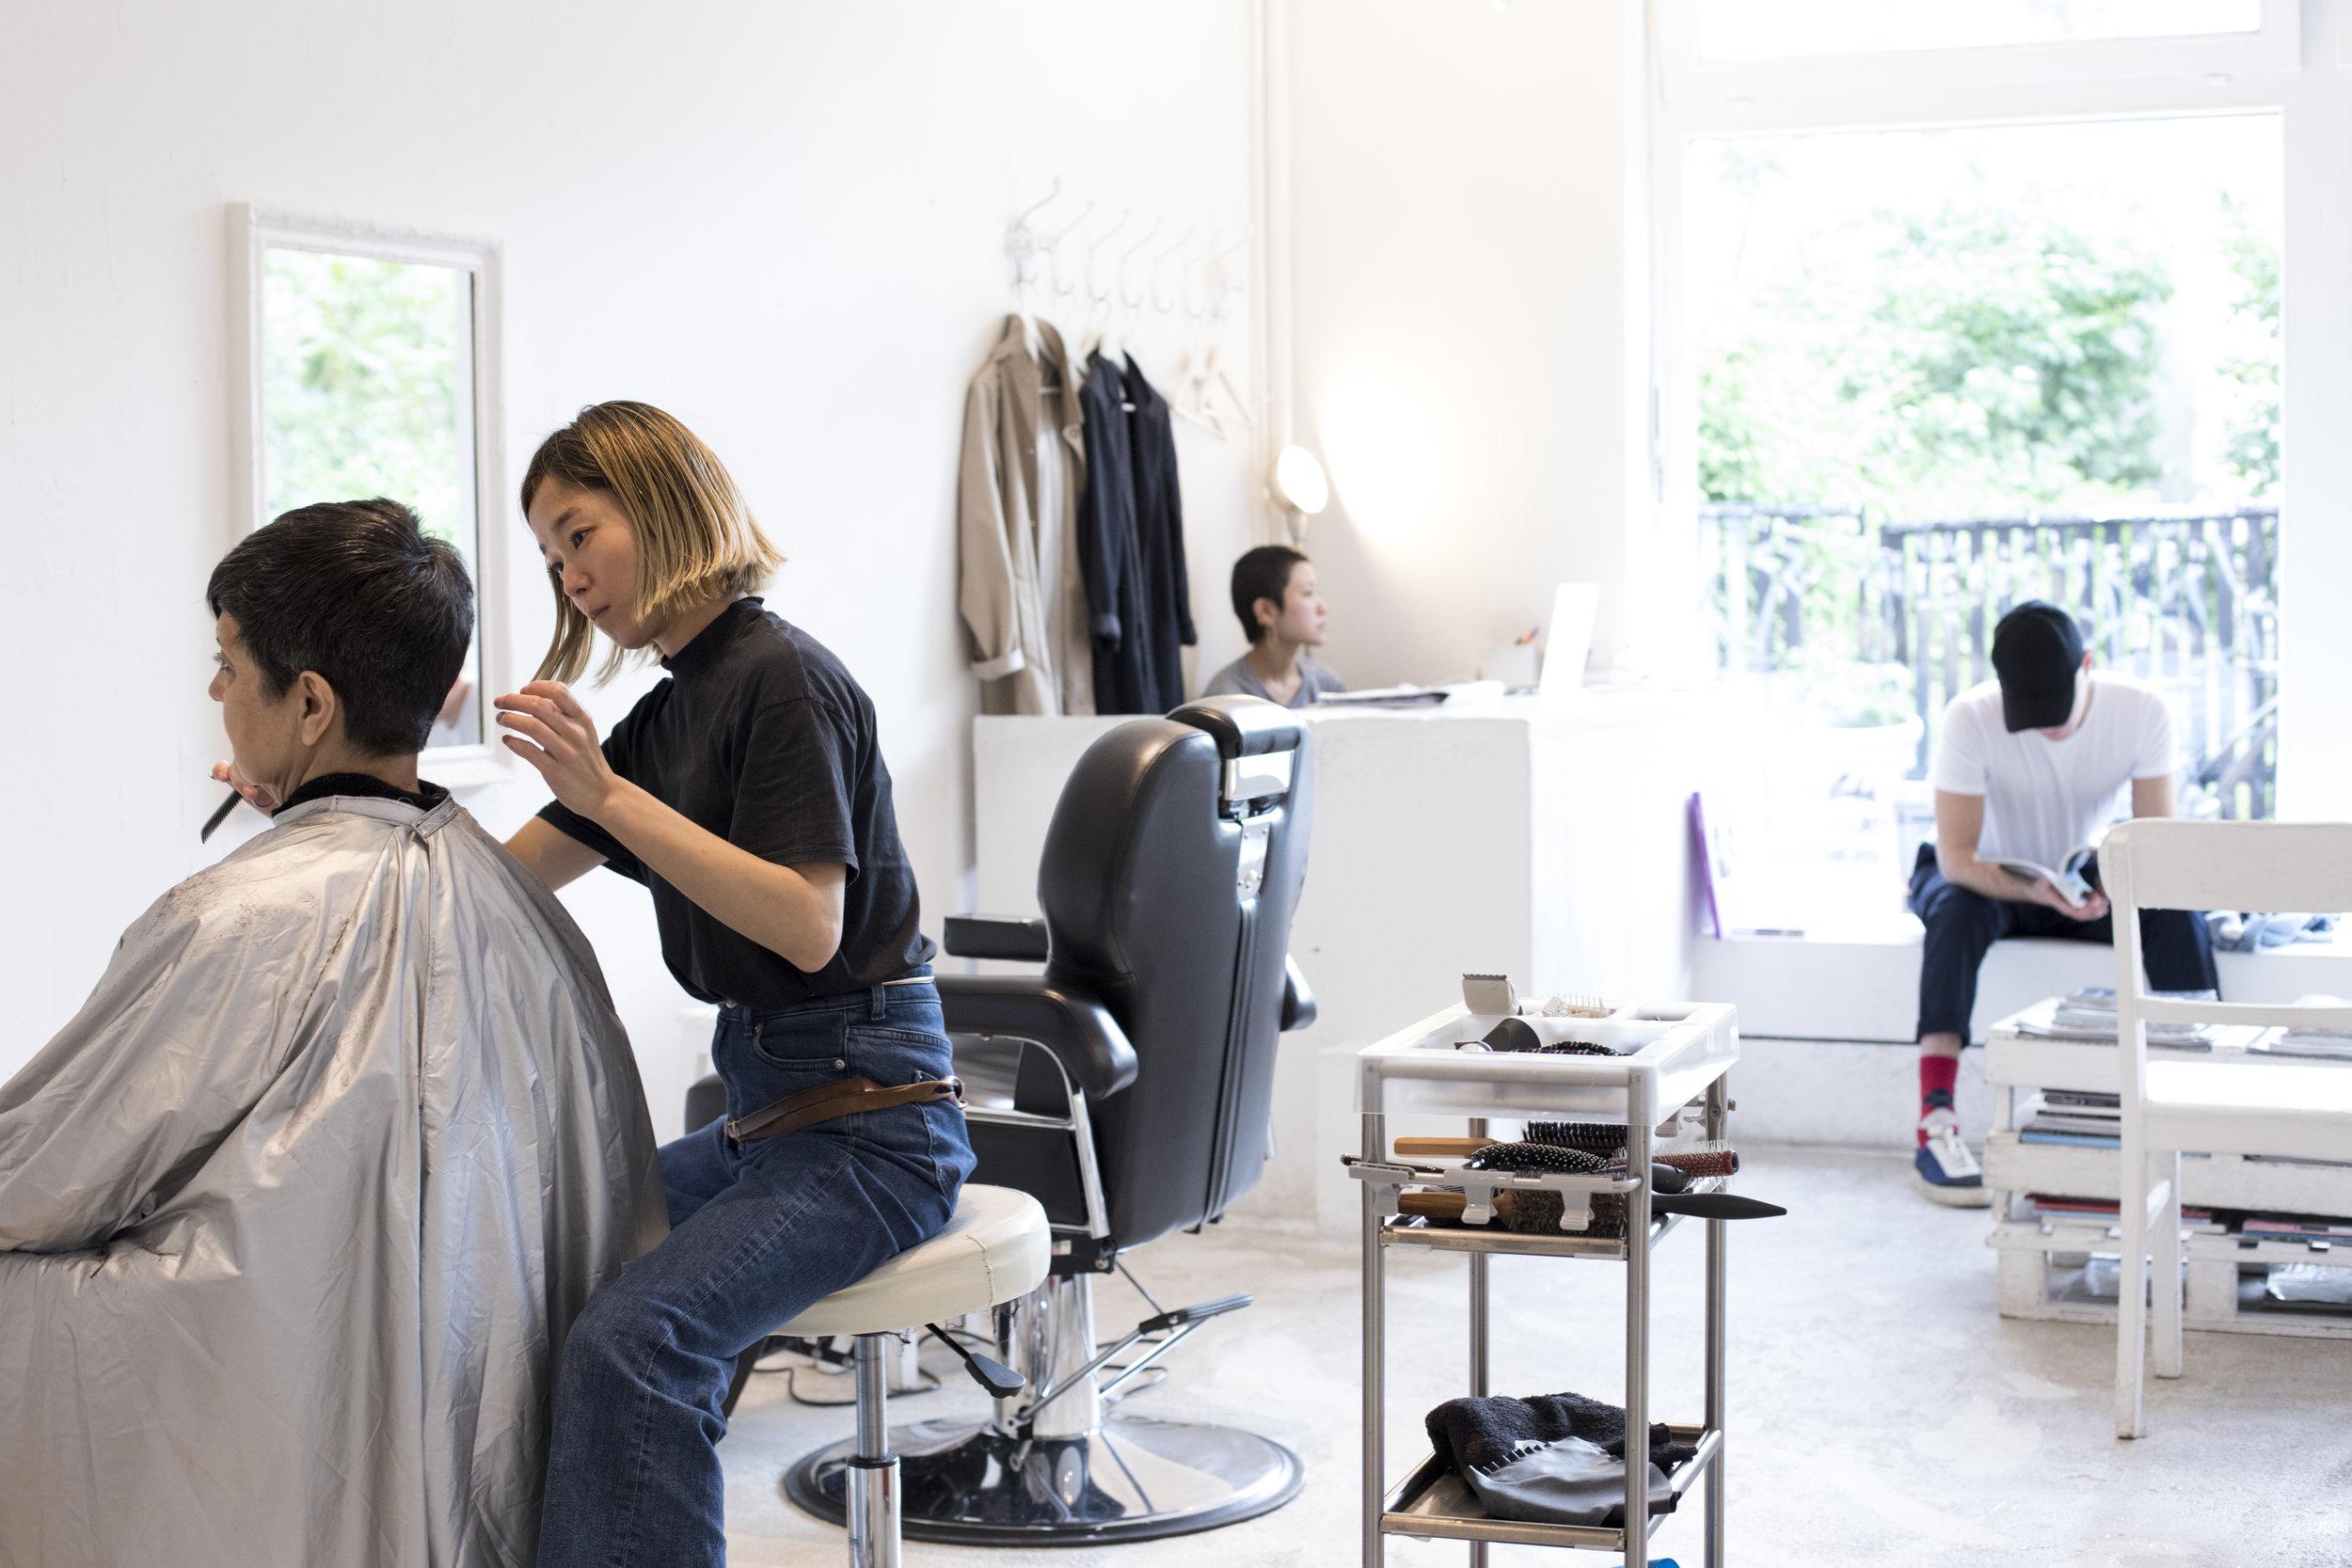 JAPANESE HAIR SALON TICRO.DE. CREDIT: HARIT SRIKHAO FOR LURE